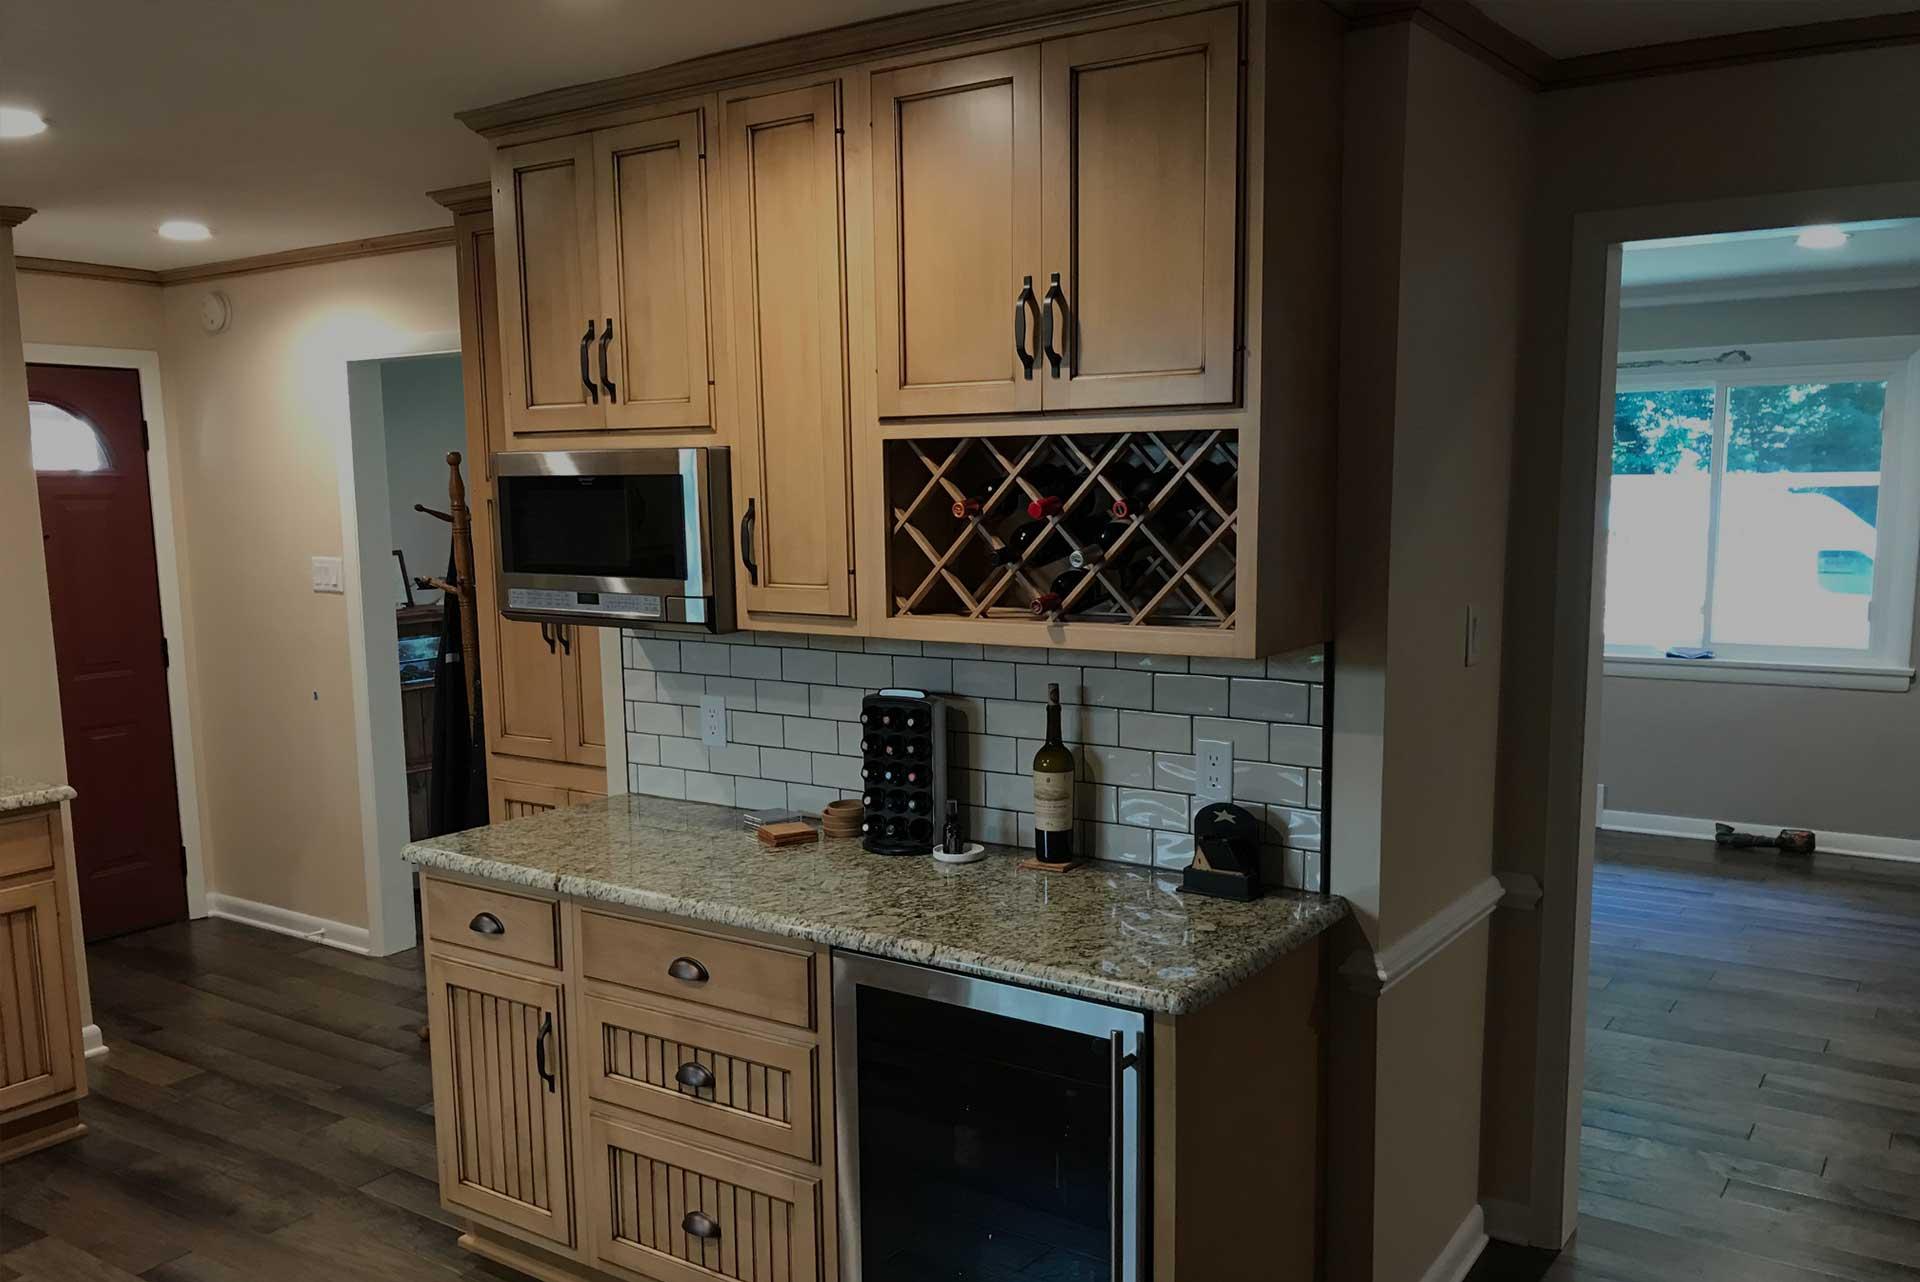 kitchen with hardwood floor & brown cabinets